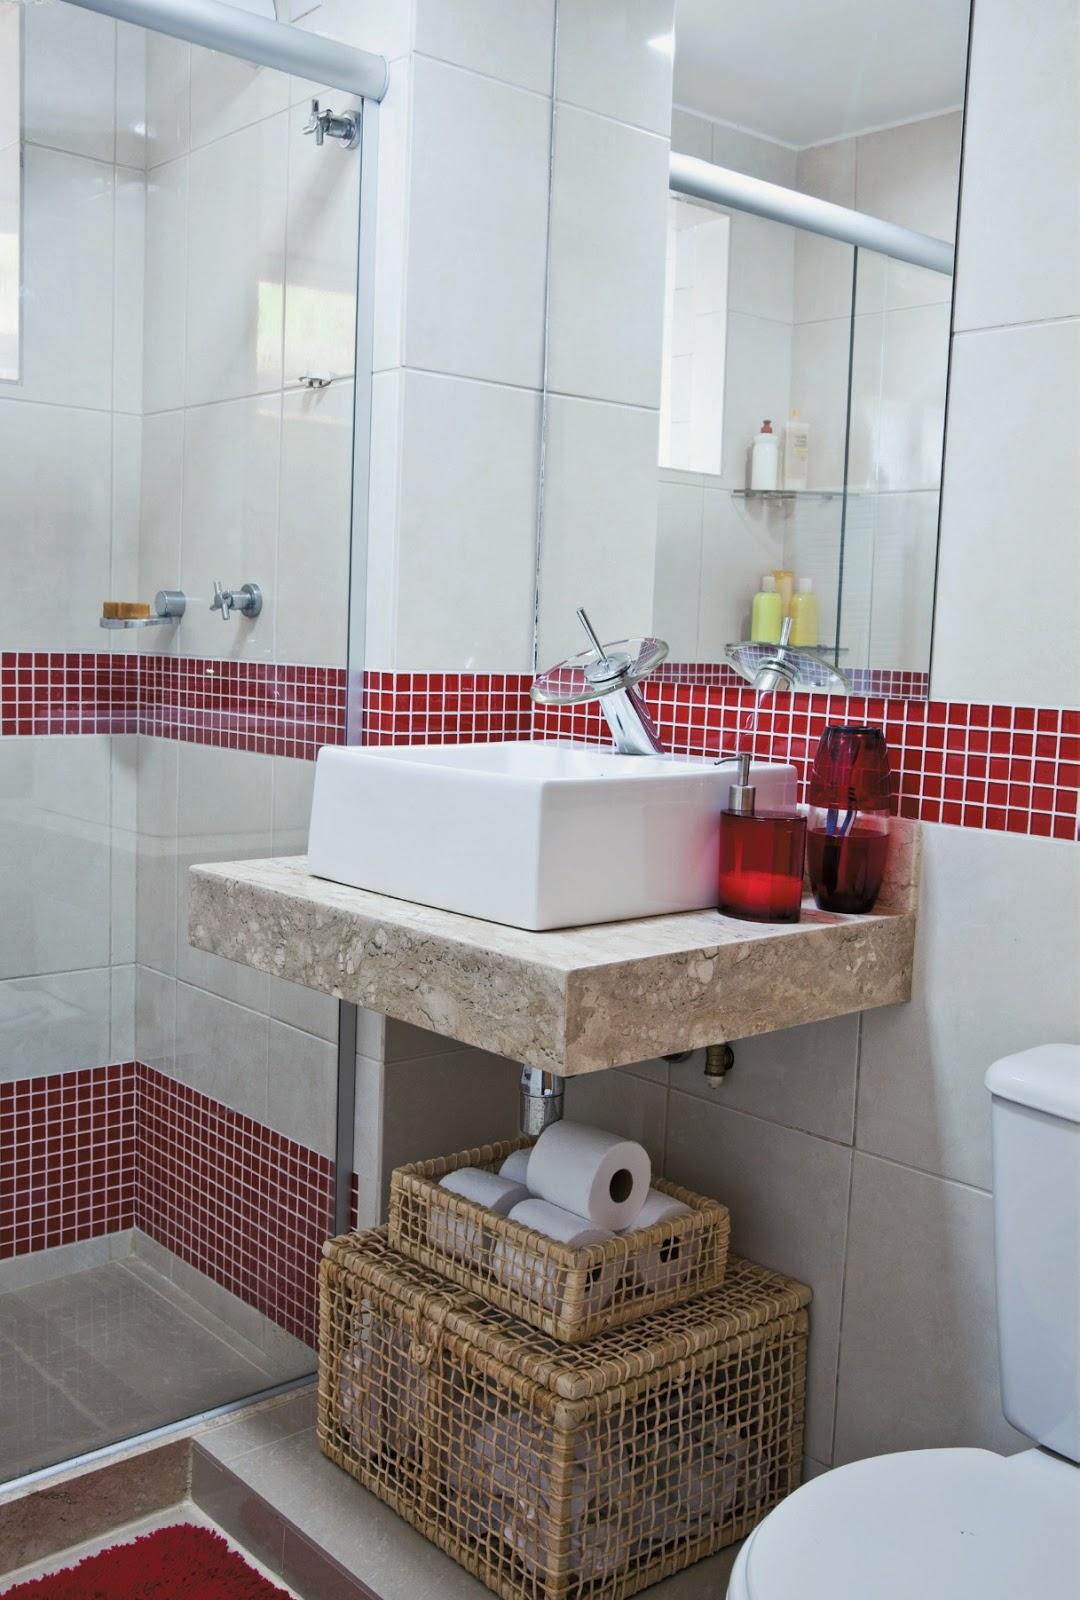 Banheiras De Canto Banheiro Pequeno Banheira Banheiros Luxo Picture #693C38 1080x1600 Banheiro De Luxo Pequeno